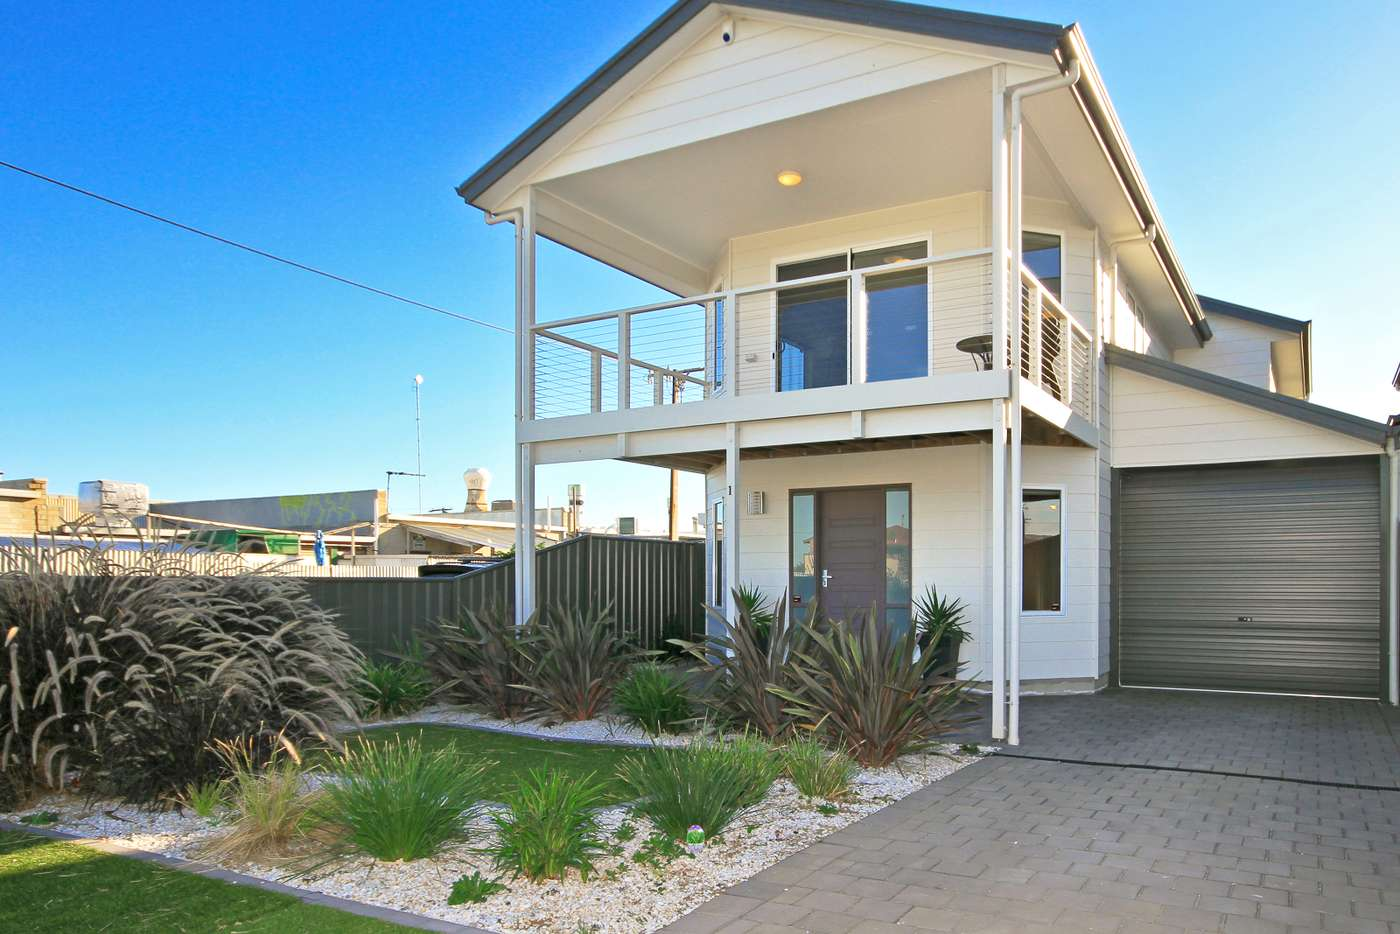 Main view of Homely house listing, 1 Butterworth Road, Aldinga Beach SA 5173